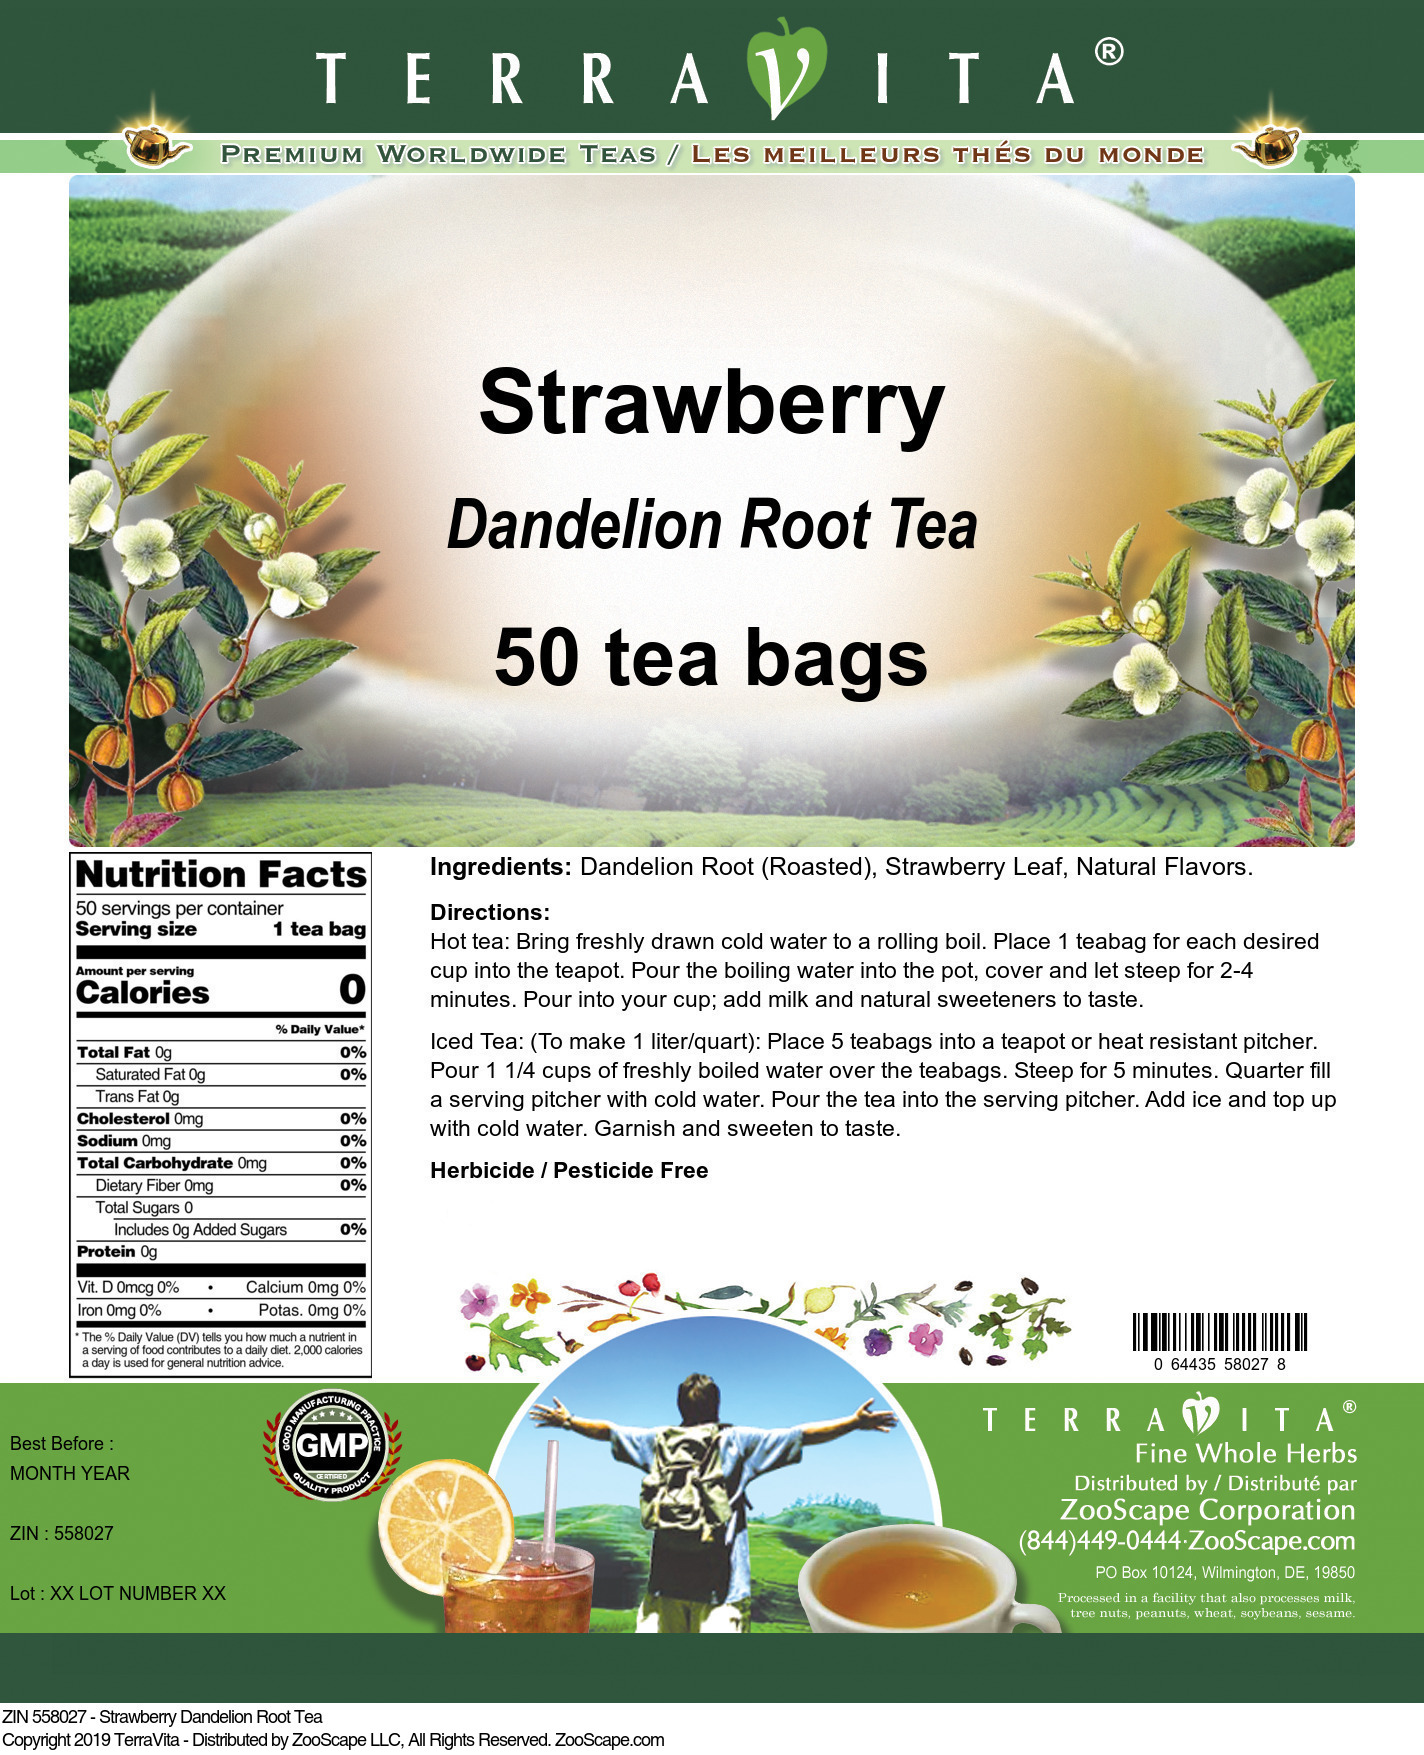 Strawberry Dandelion Root Tea